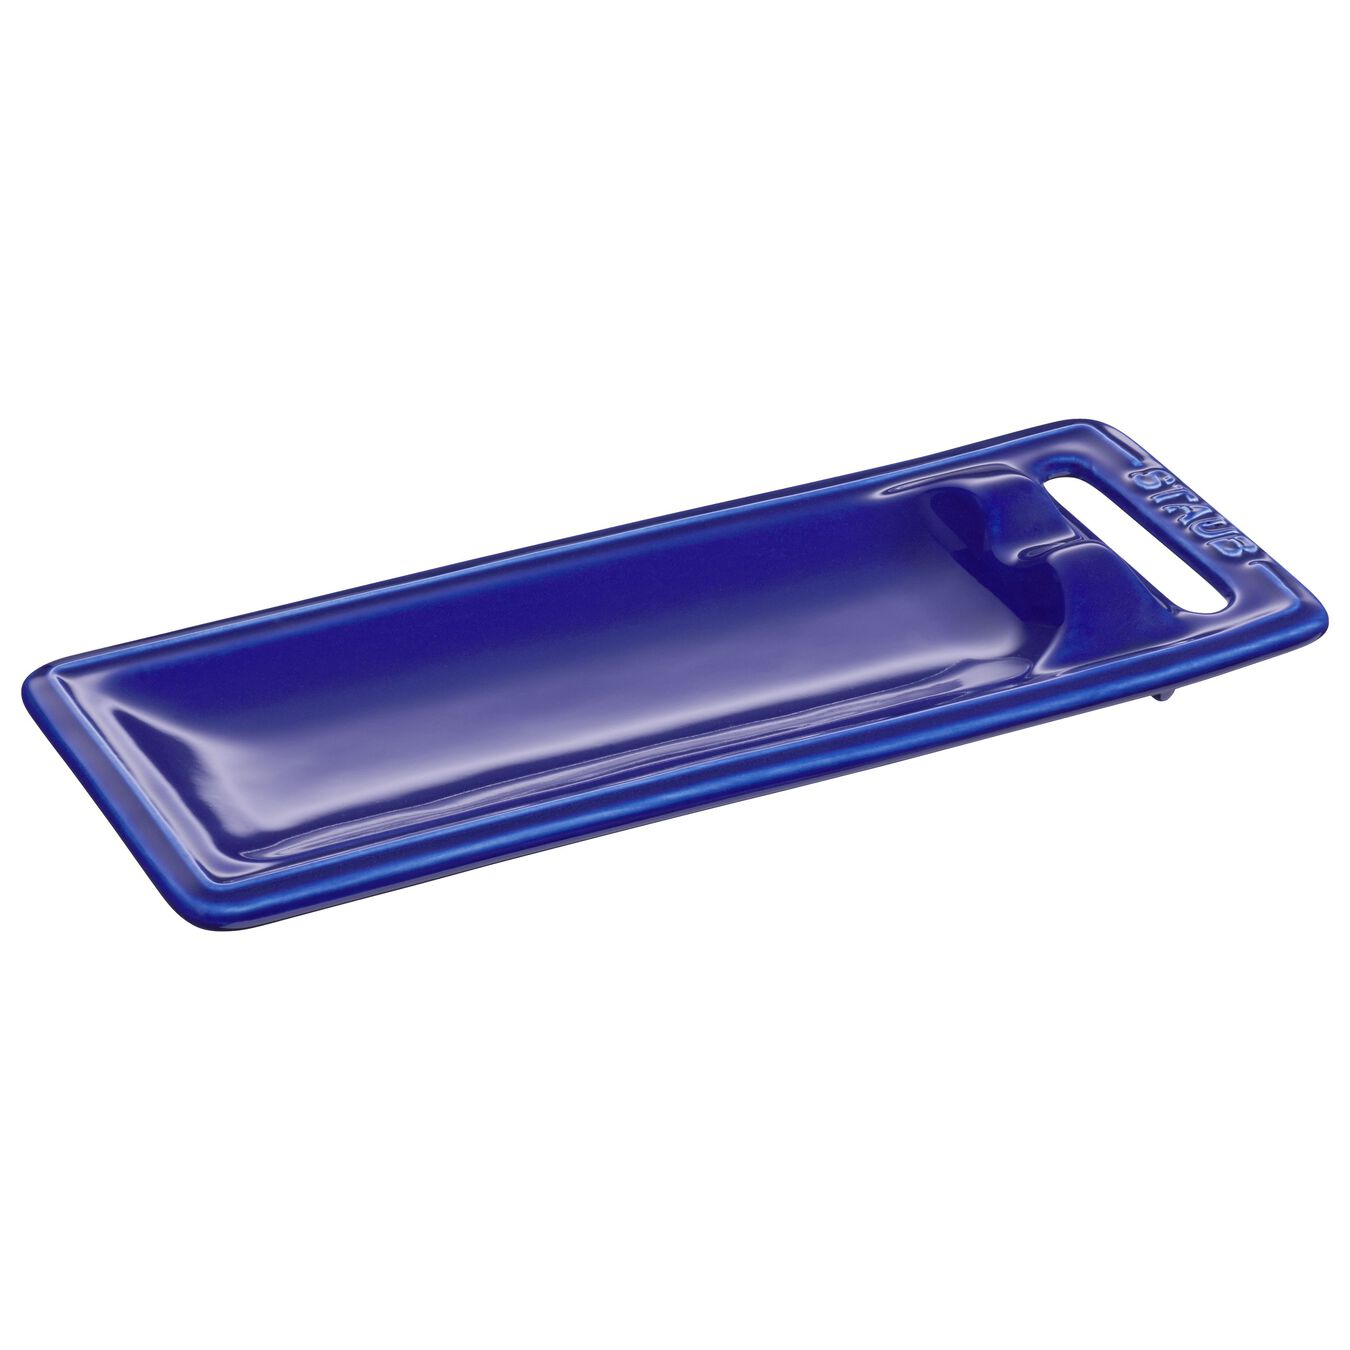 25 cm x 10 cm Spoon rest, dark-blue,,large 1